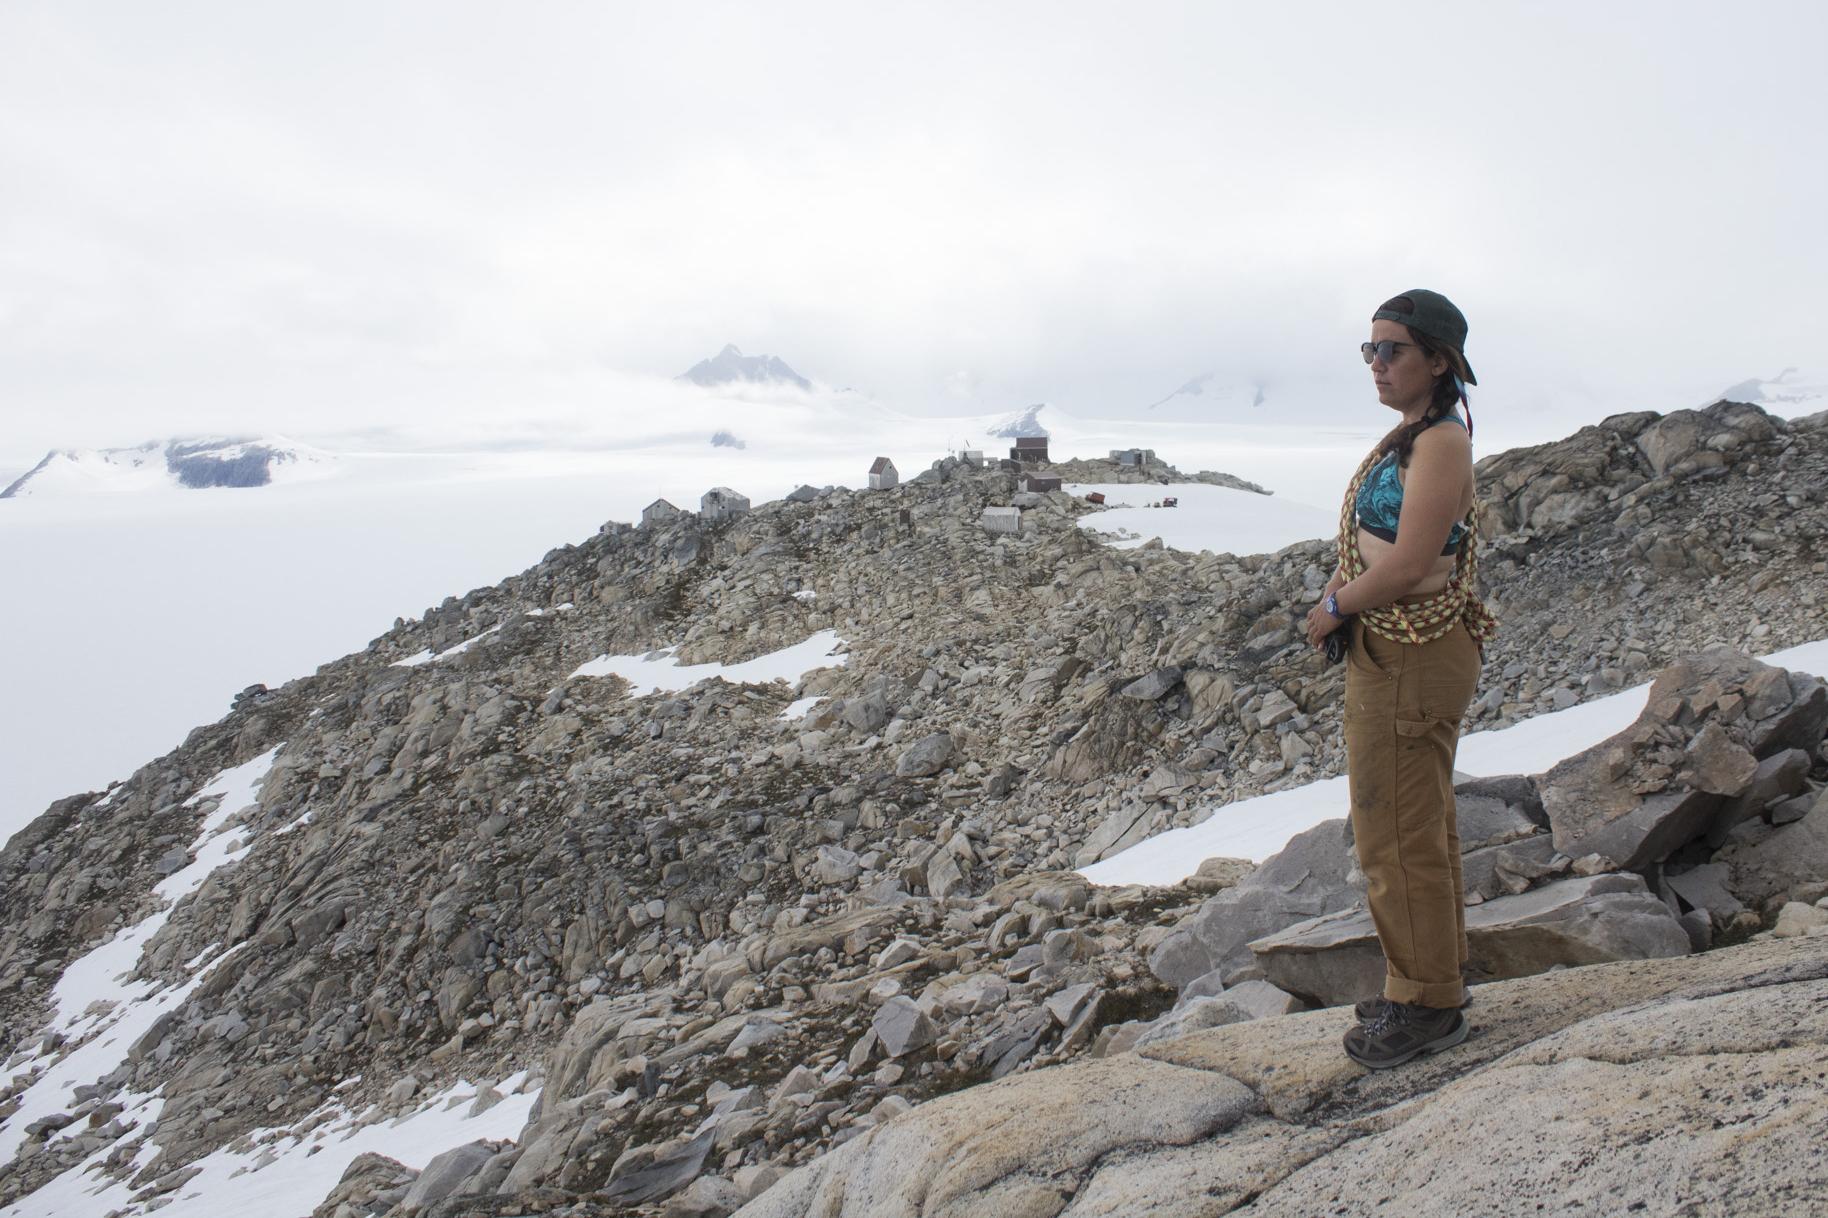 Hannah (self-portrait), Camp 10, Taku Glacier, 2017